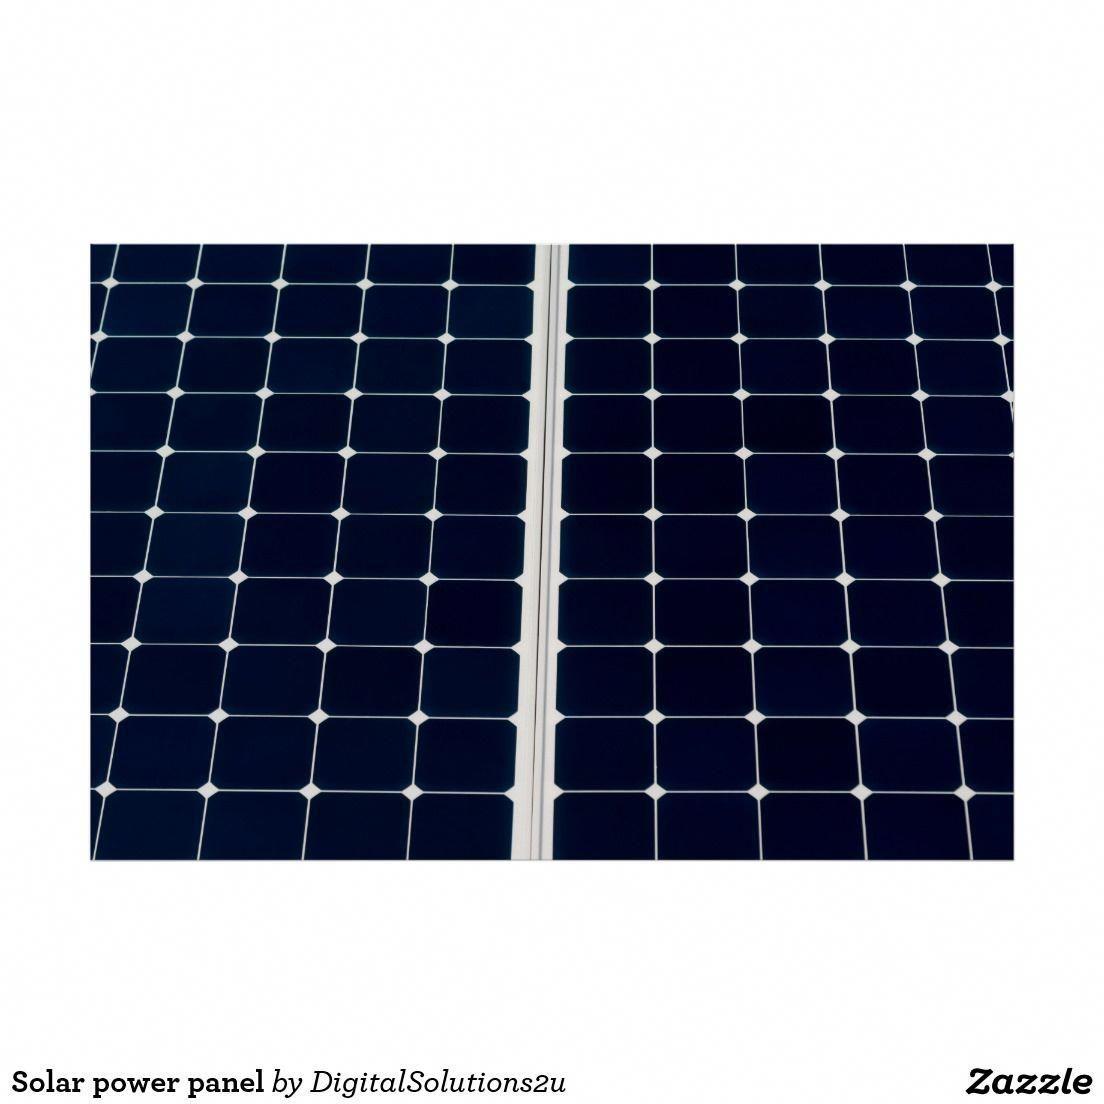 Solar Power Panel Poster Solarpanels Solarenergy Solarpower Solargenerator Solarpanelkits Solarwaterh In 2020 Solar Power Panels Used Solar Panels Solar Energy Panels